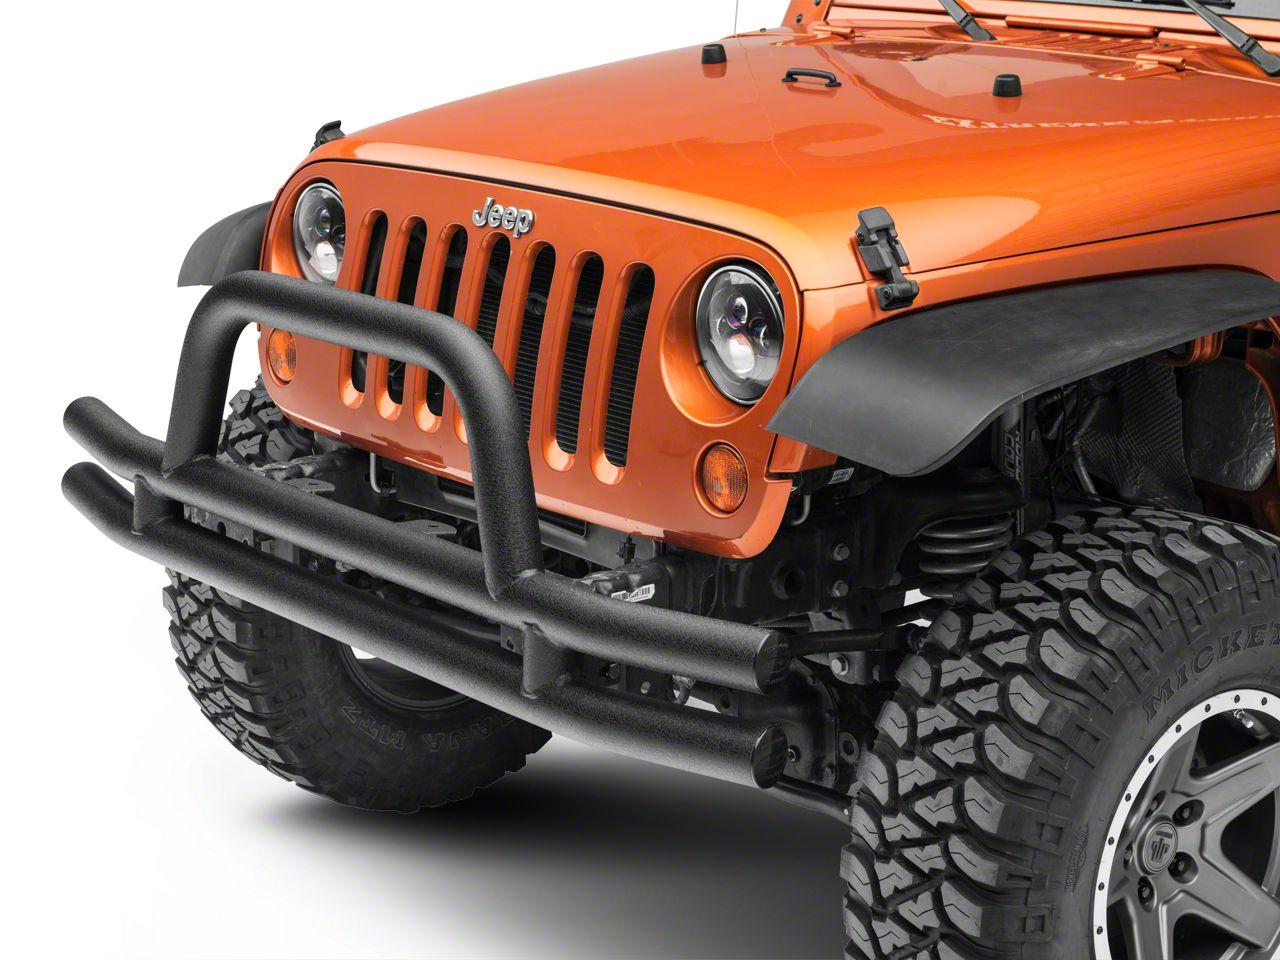 Smittybilt Tubular Front Bumper w/ Hoop - Textured Black (07-18 Jeep Wrangler JK)